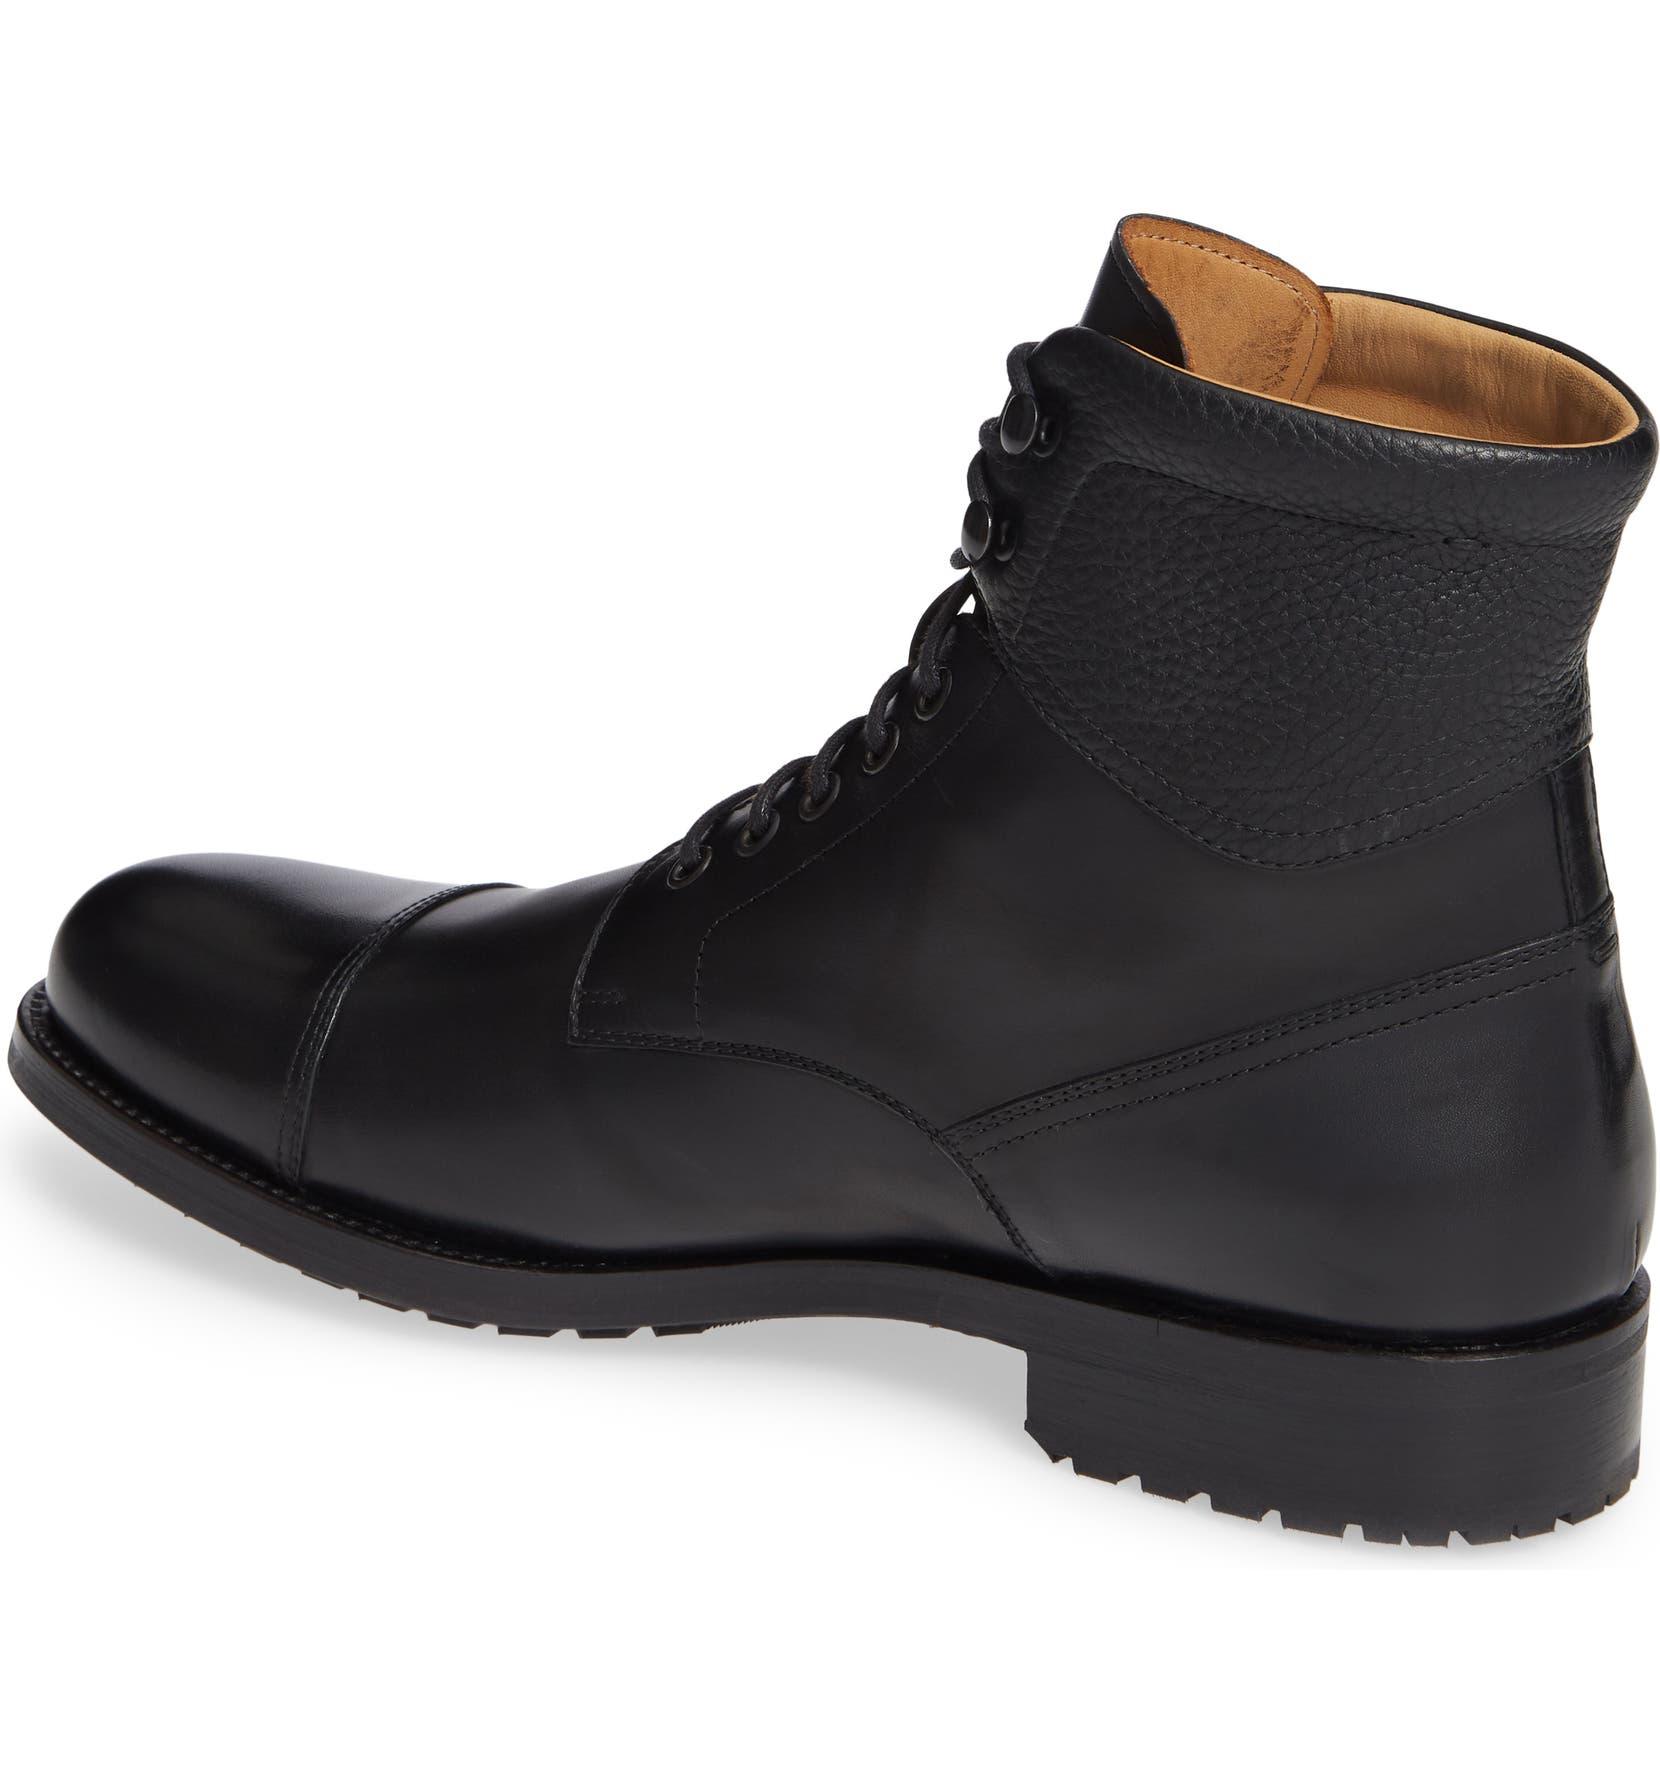 662fc8644d2 Peyton Cap Toe Boot